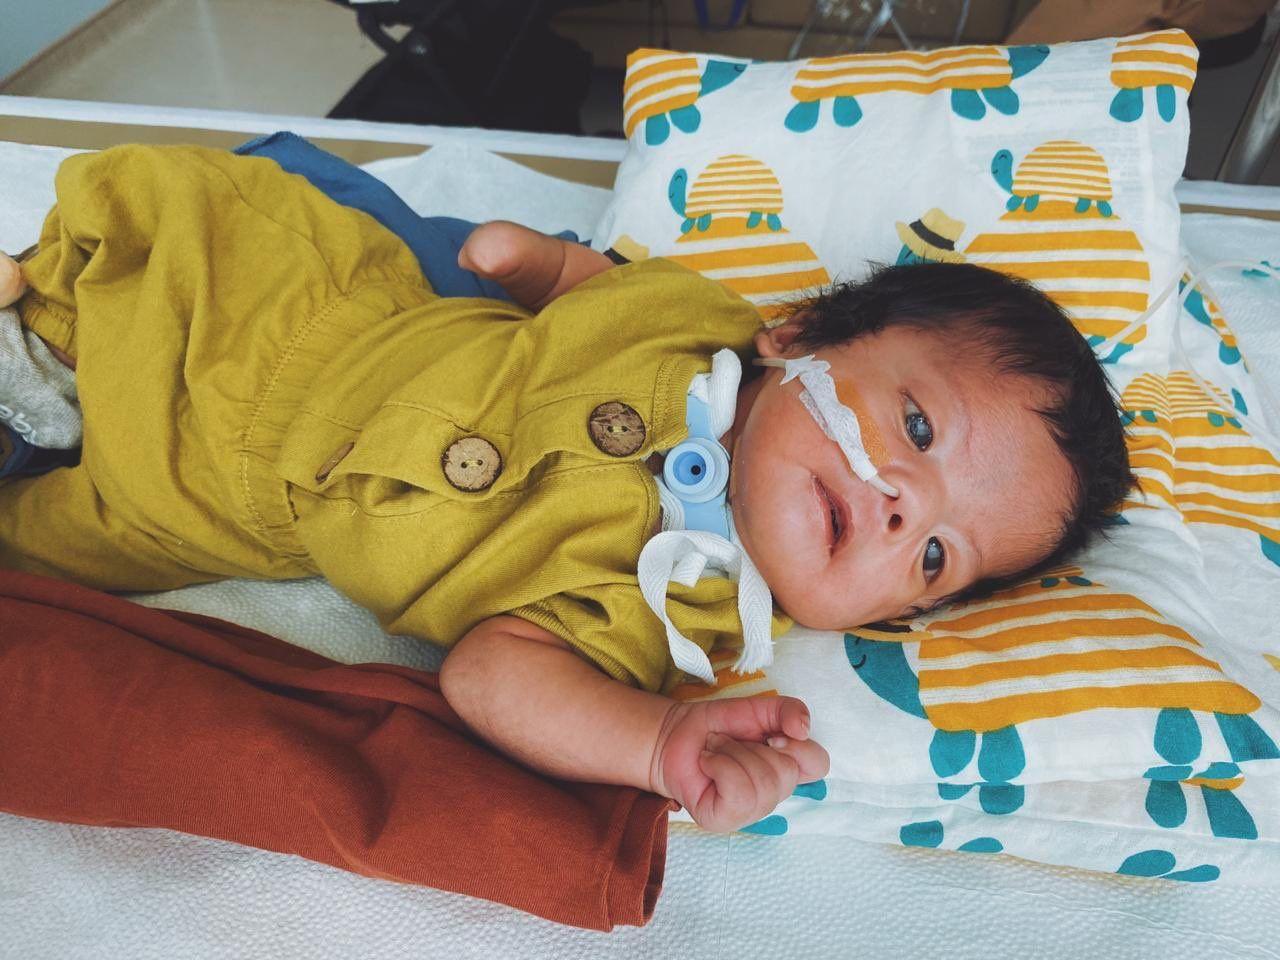 Hiro, bayi yang alami Moebius syndrome